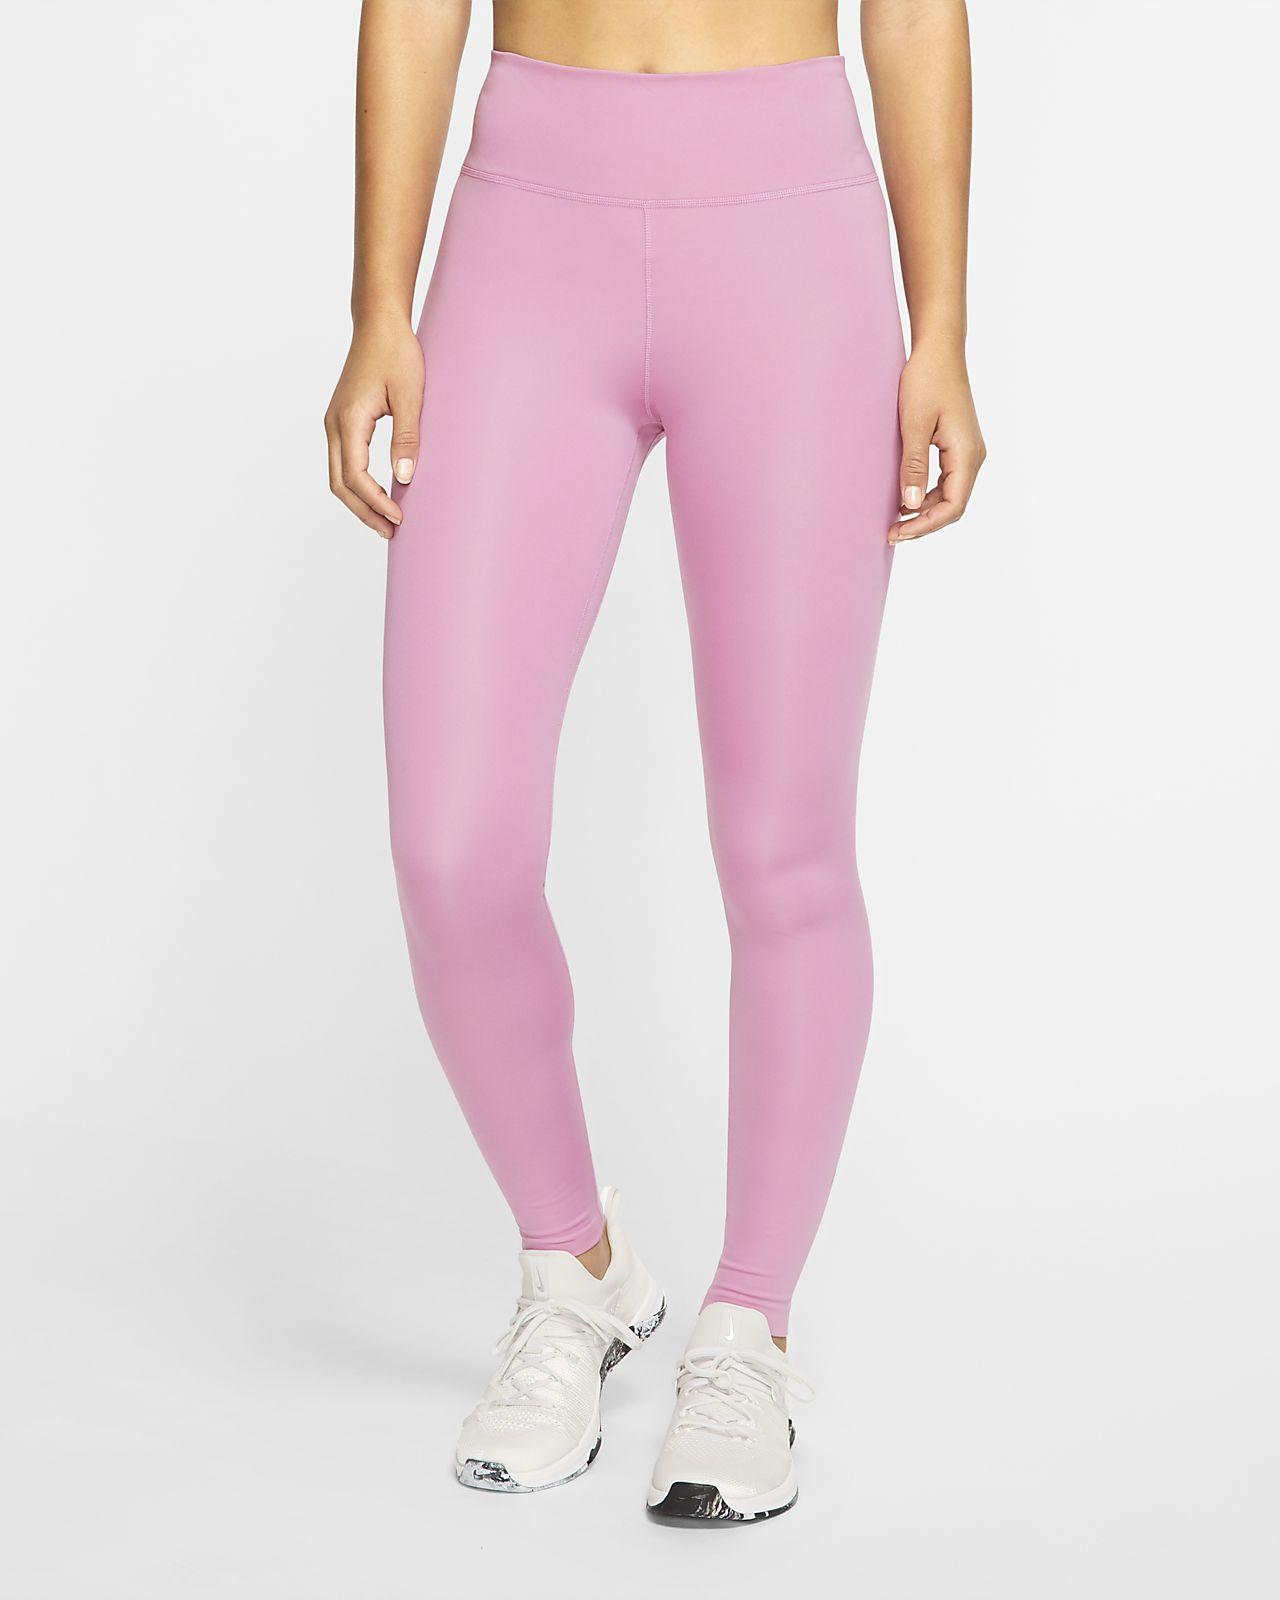 Nike One Luxe Damestights met halfhoge taille